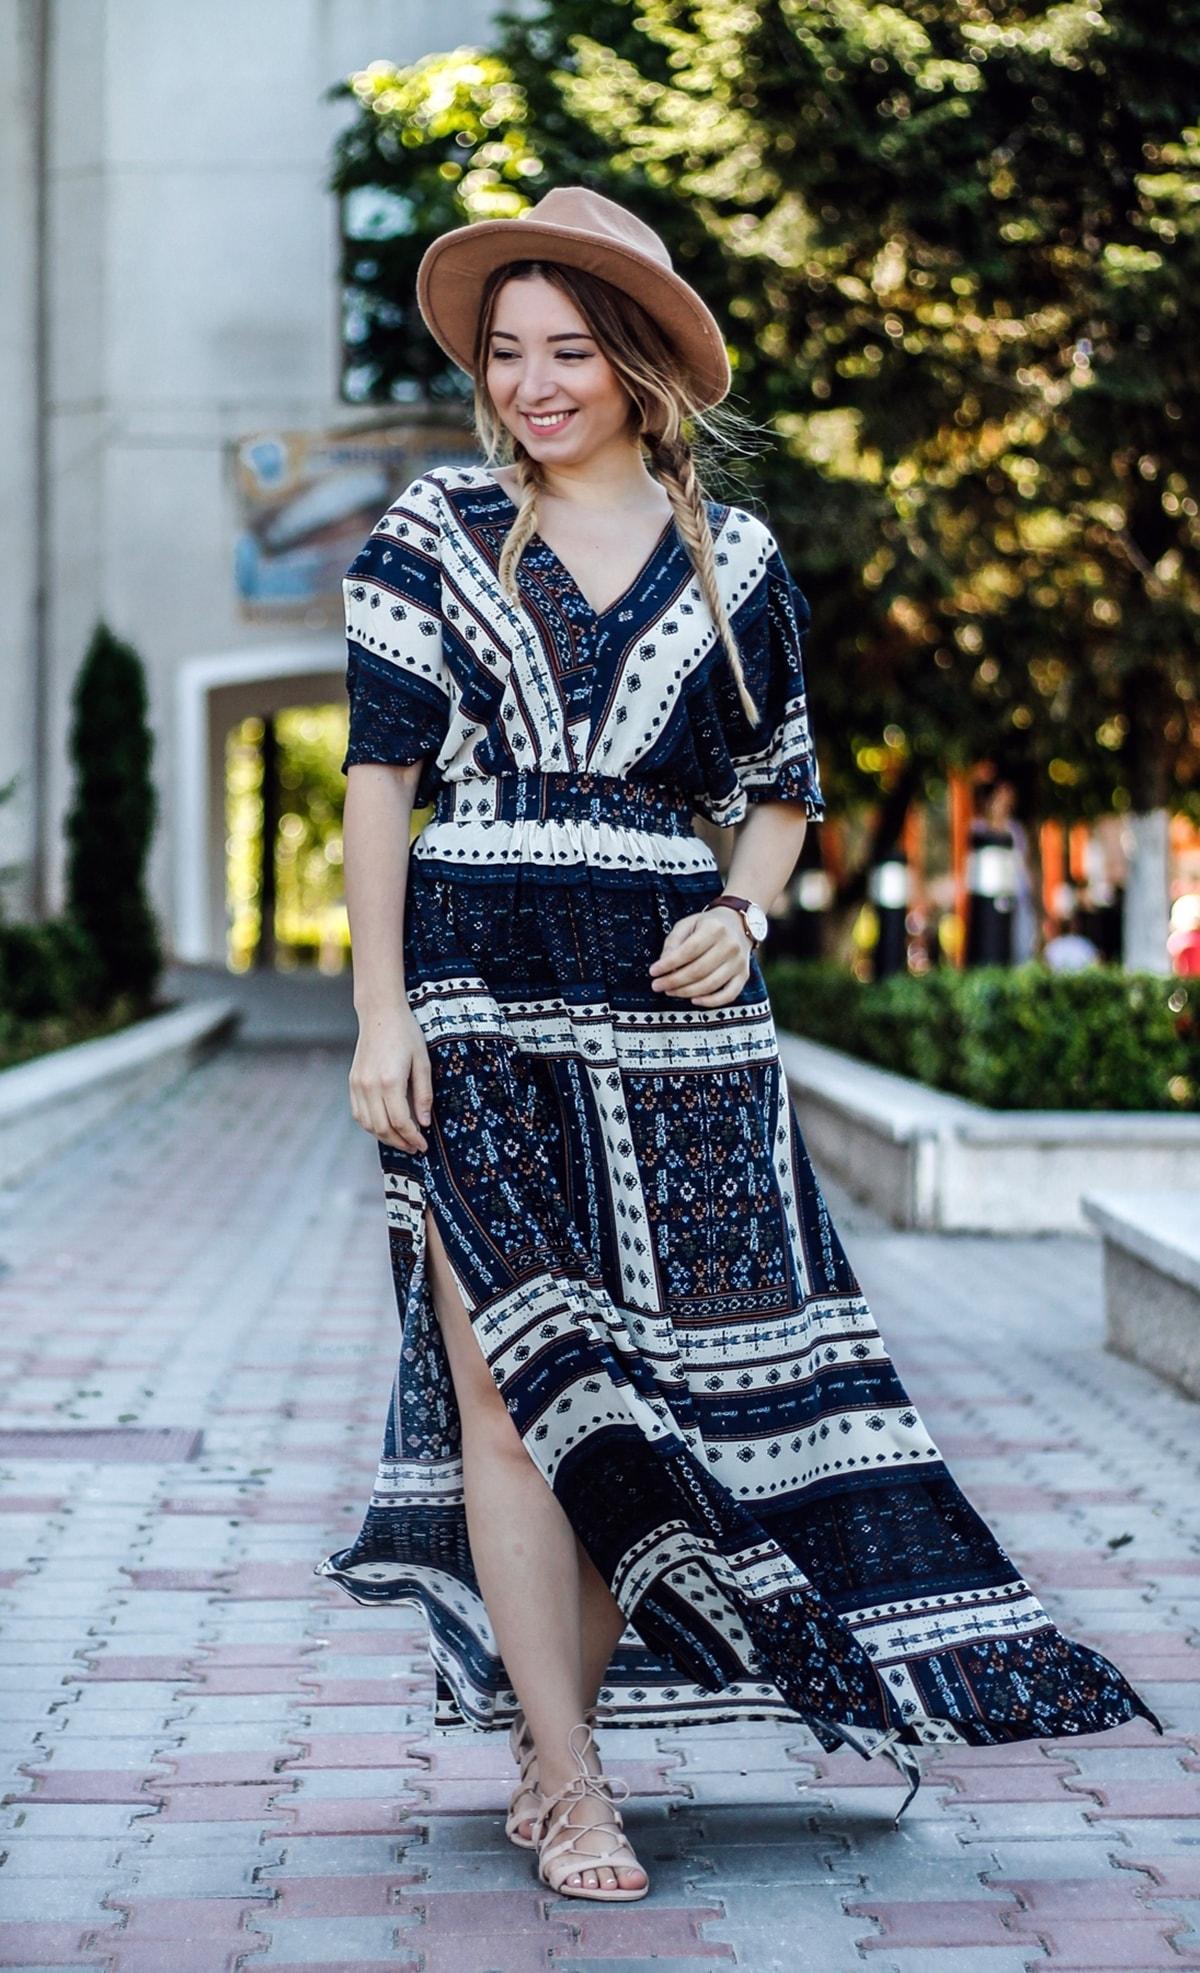 Andreea Ristea - cum mai purtam rochia maxi? TYinuta de vara: rochie maxi de inspiratie hippie si palarie camel